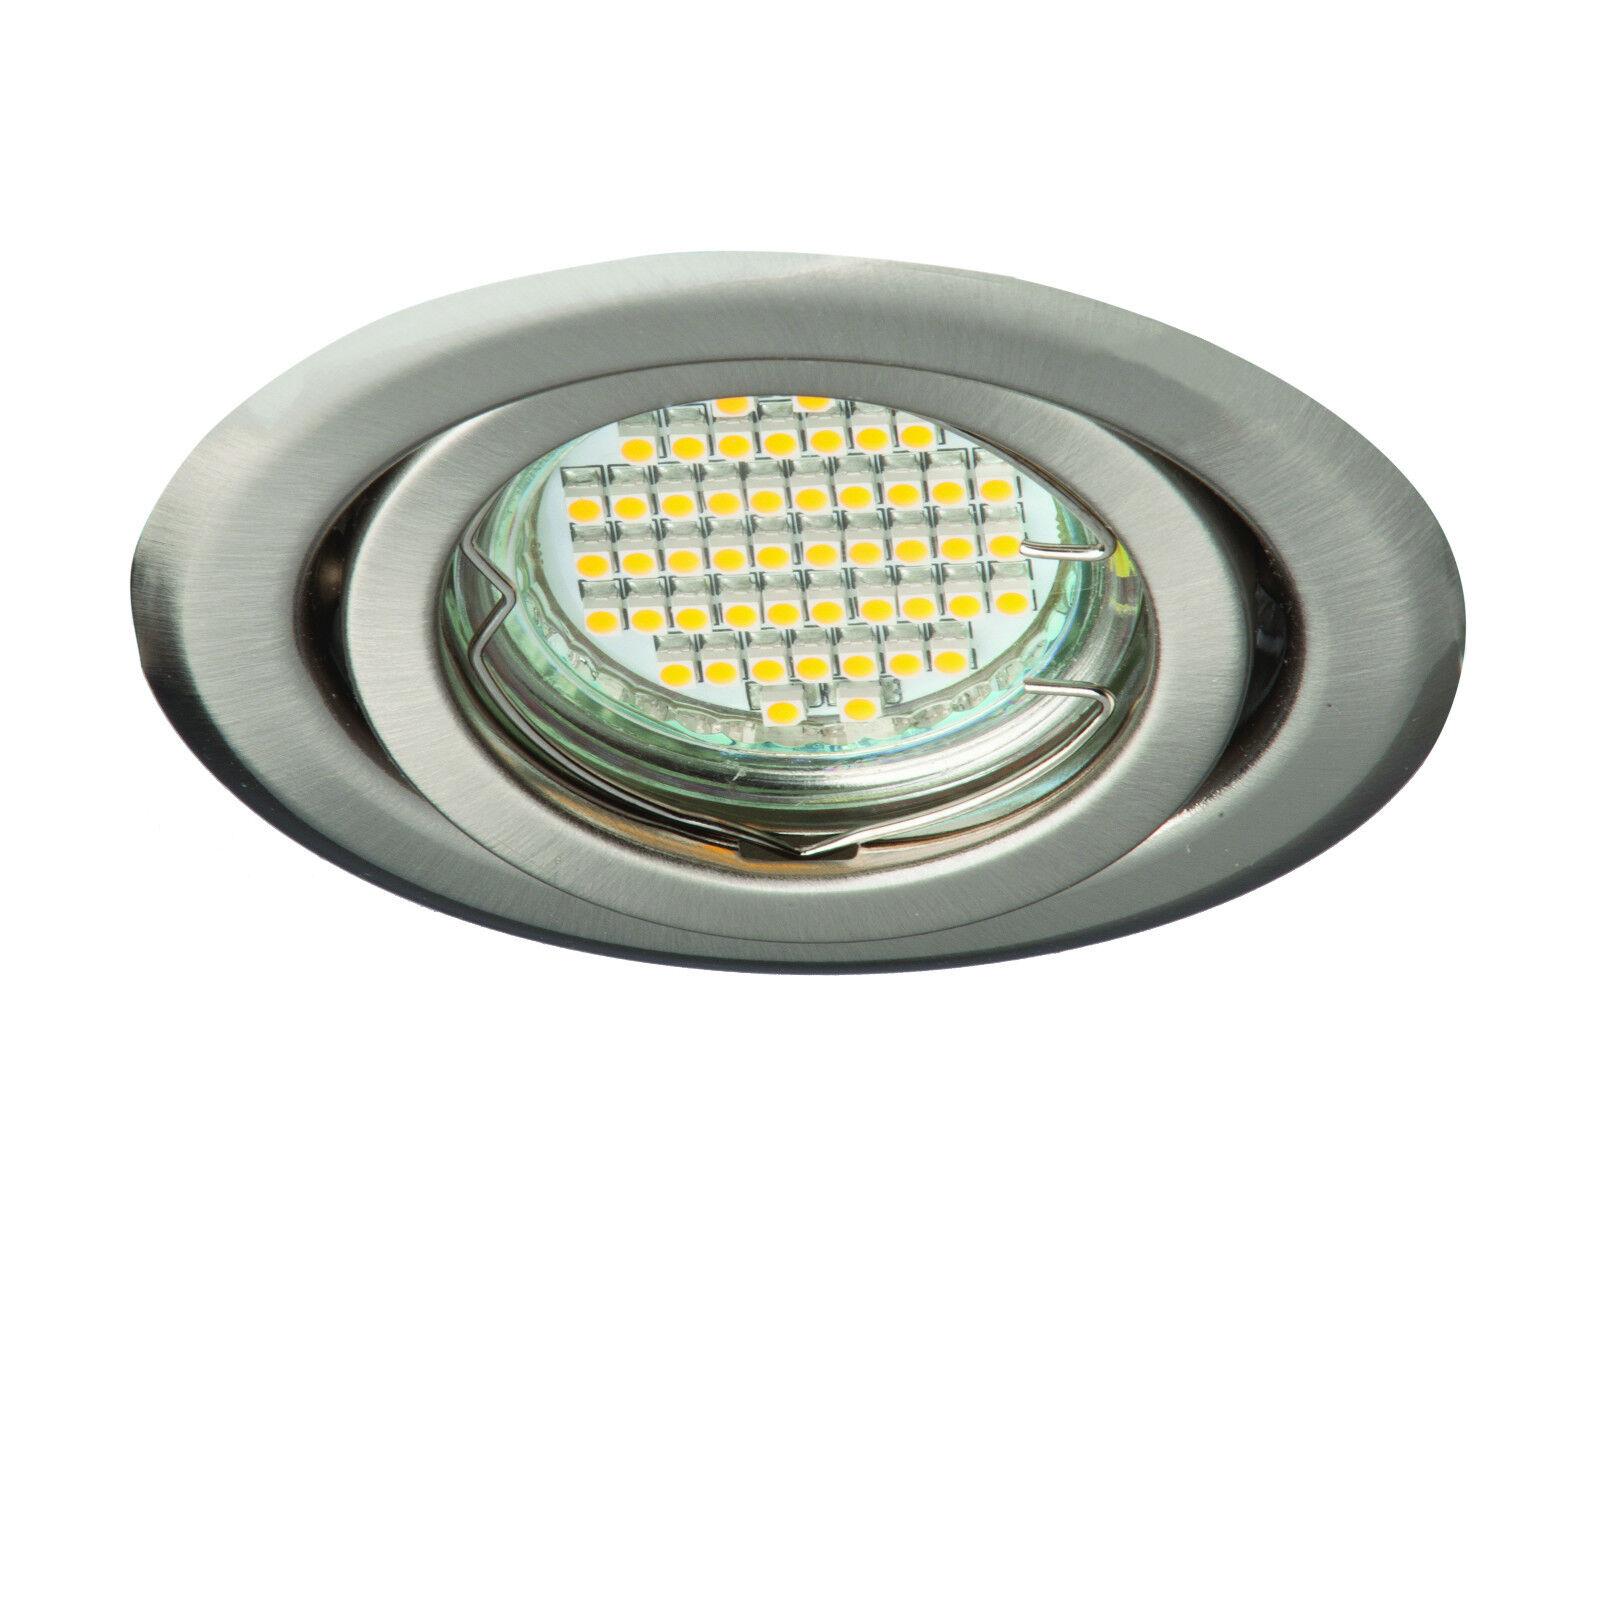 100x Round Ceiling Tilted Recessed Downlights Spotlights GU5.3 GU10 230V OH15